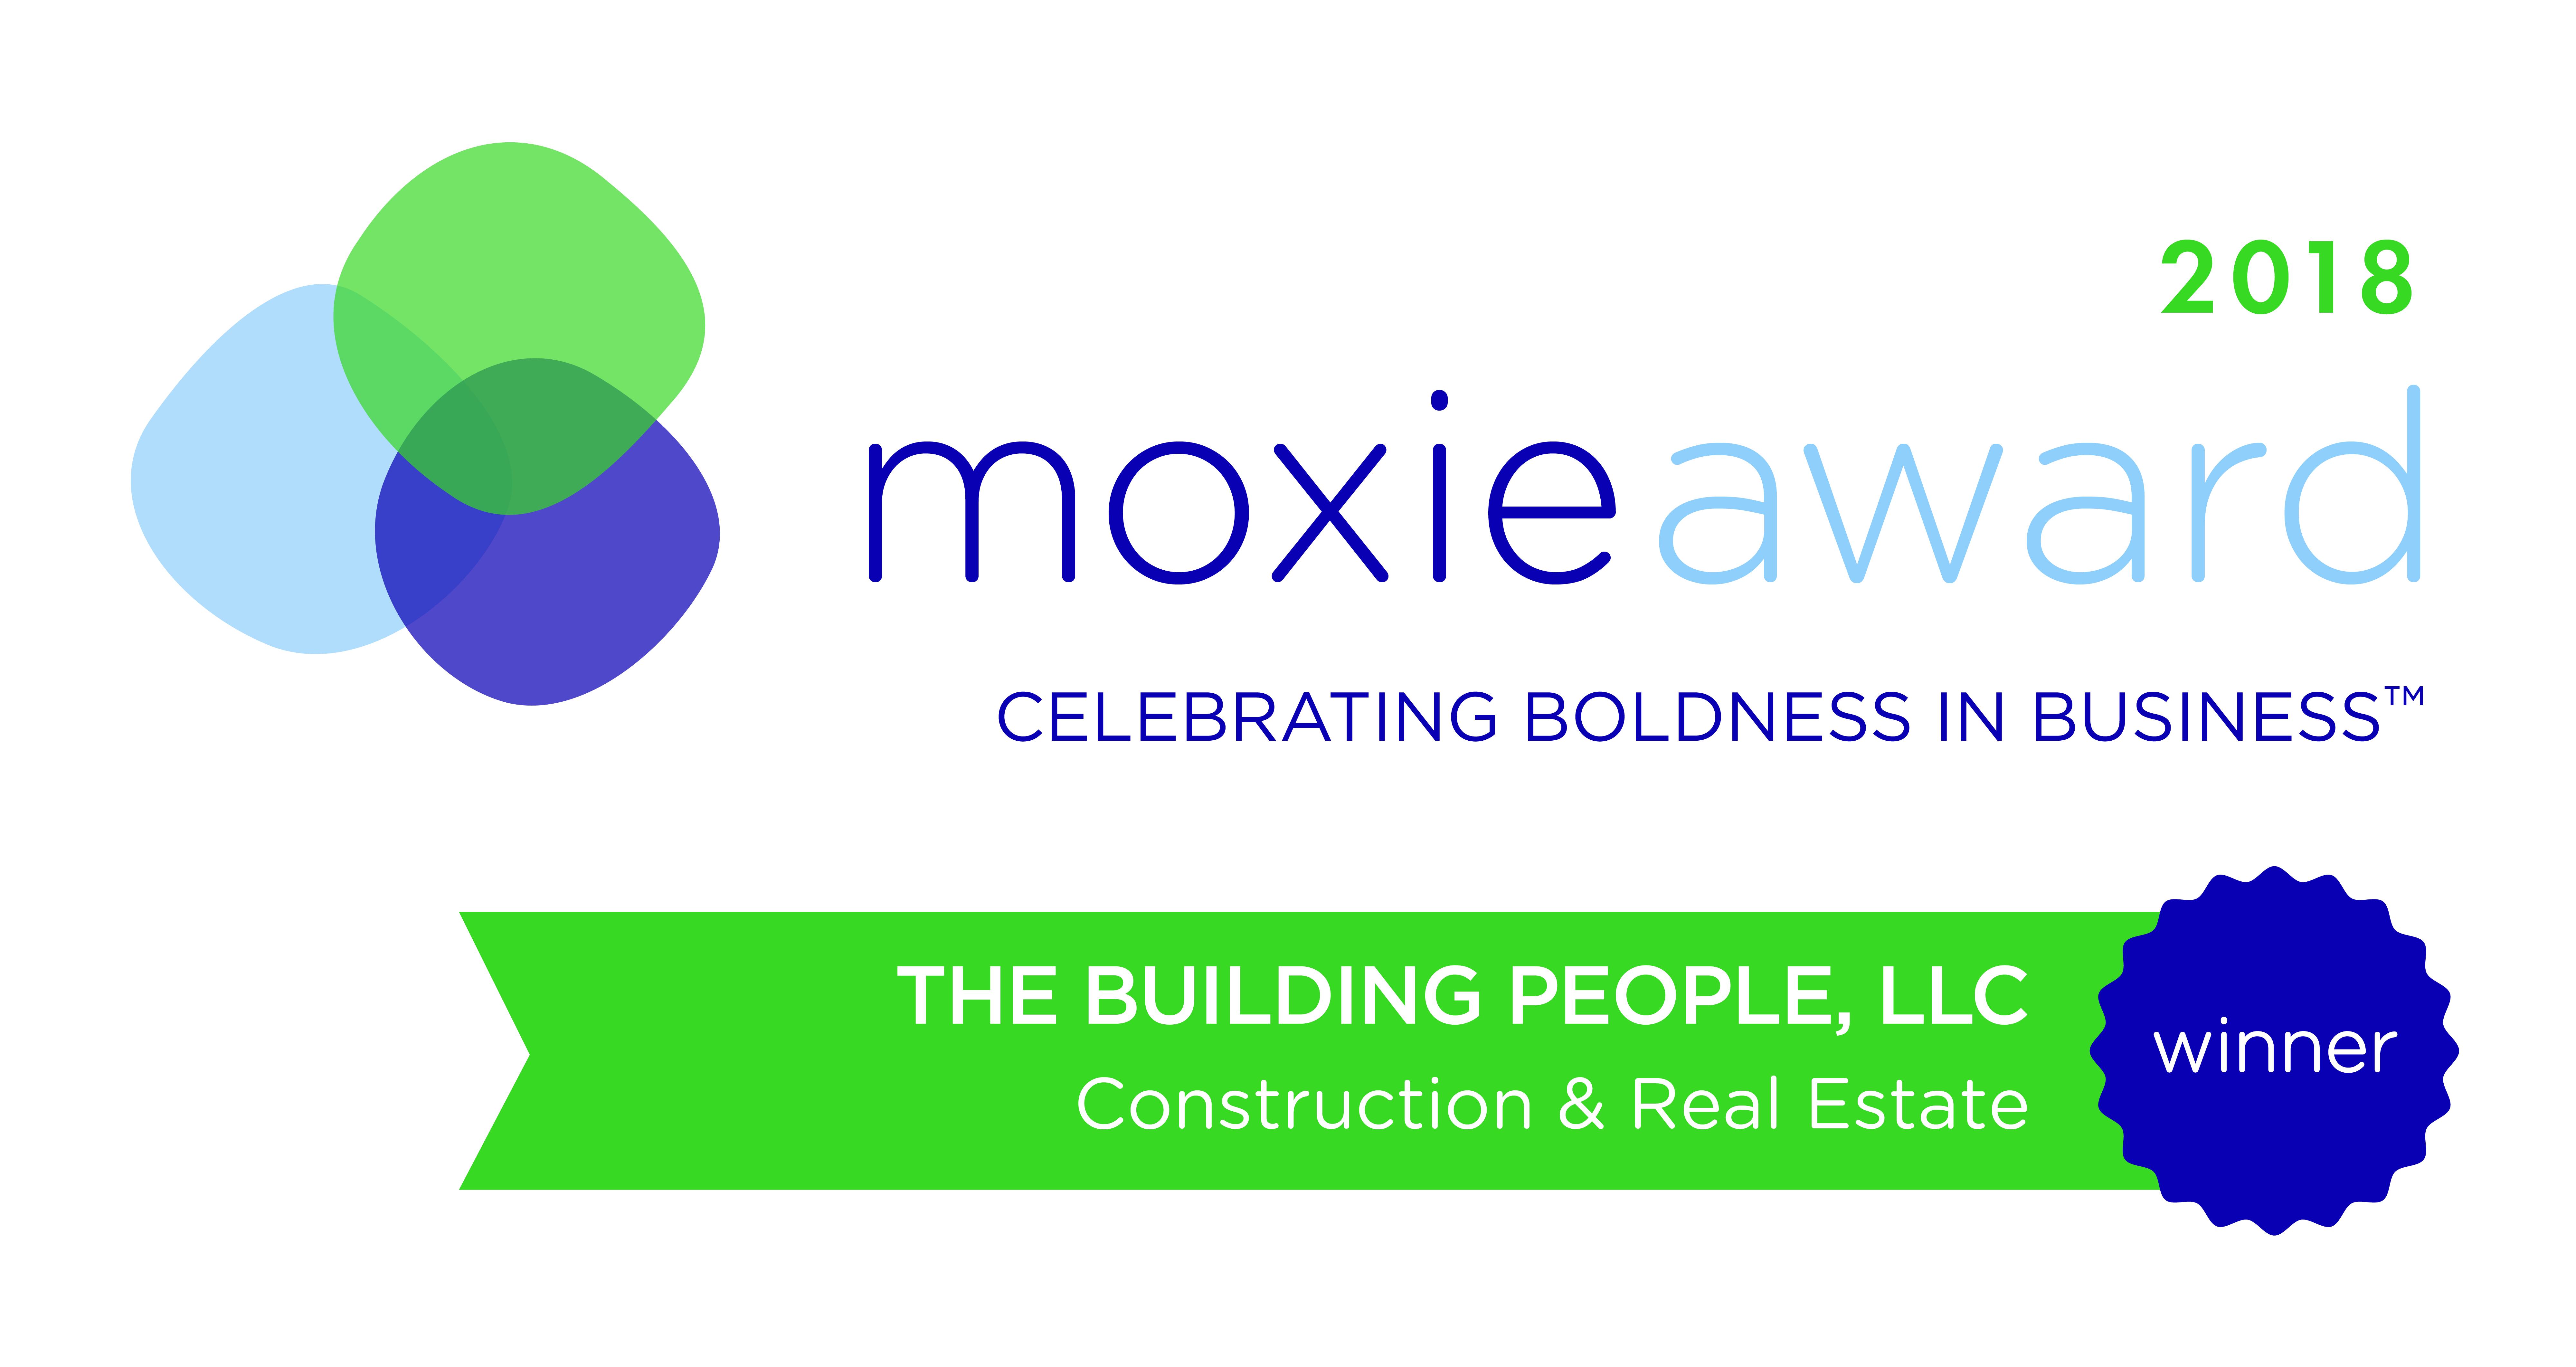 moxie-award-2018-finalist-constructionrealestate (1)